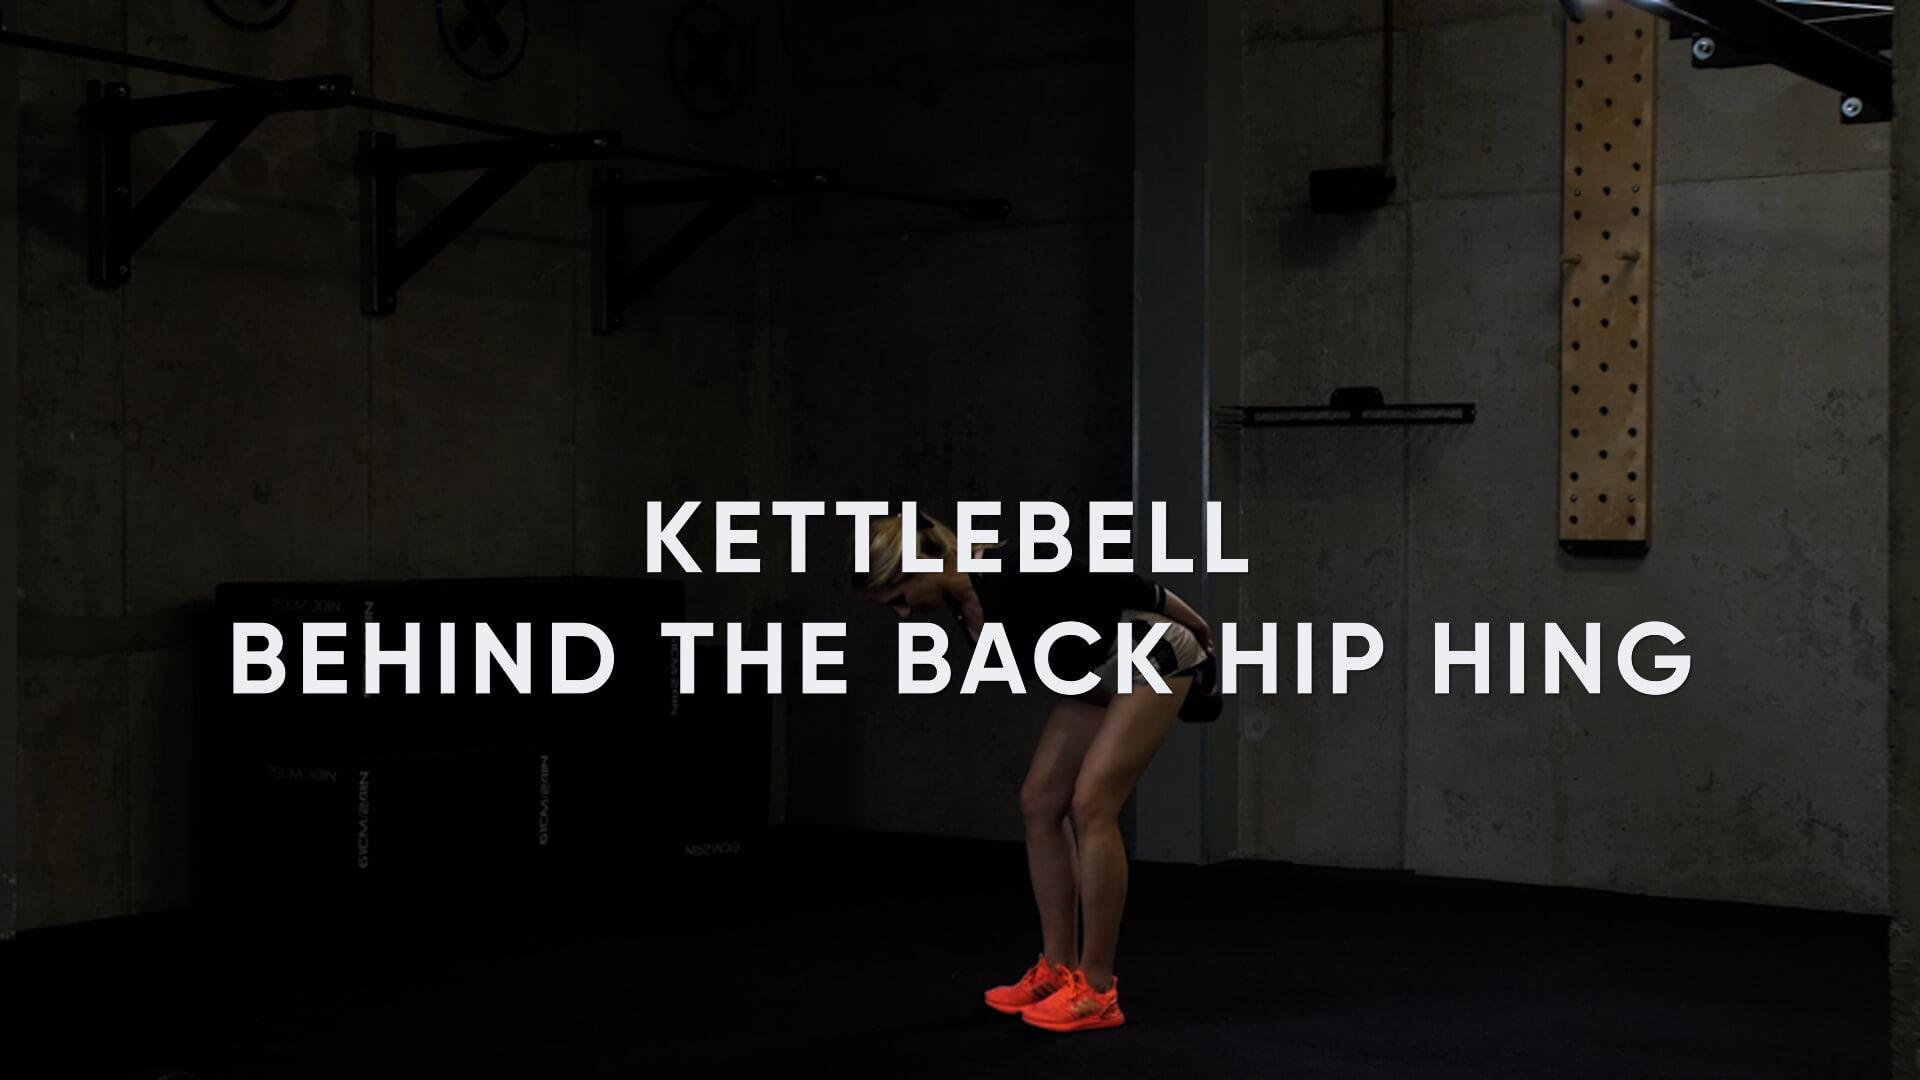 Kettlebell Behind the Back Hip Hinge